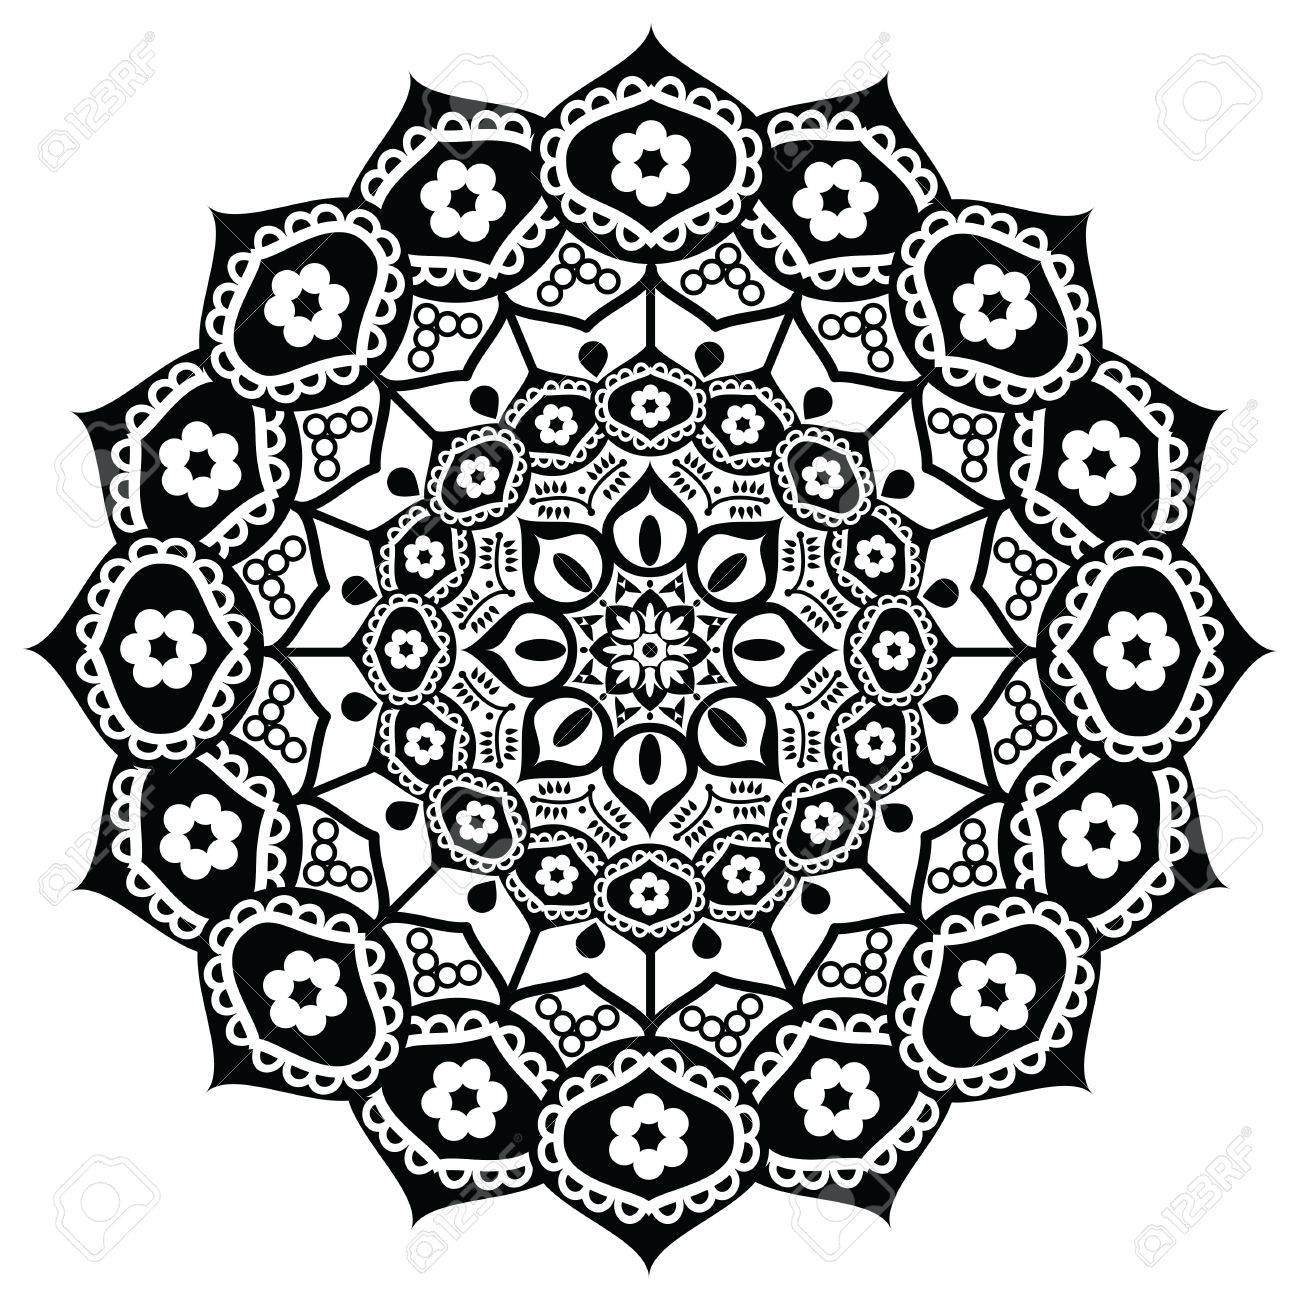 Lotus flower representing meaning exactness spiritual awakening lotus flower representing meaning exactness spiritual awakening and purity in buddhism in black izmirmasajfo